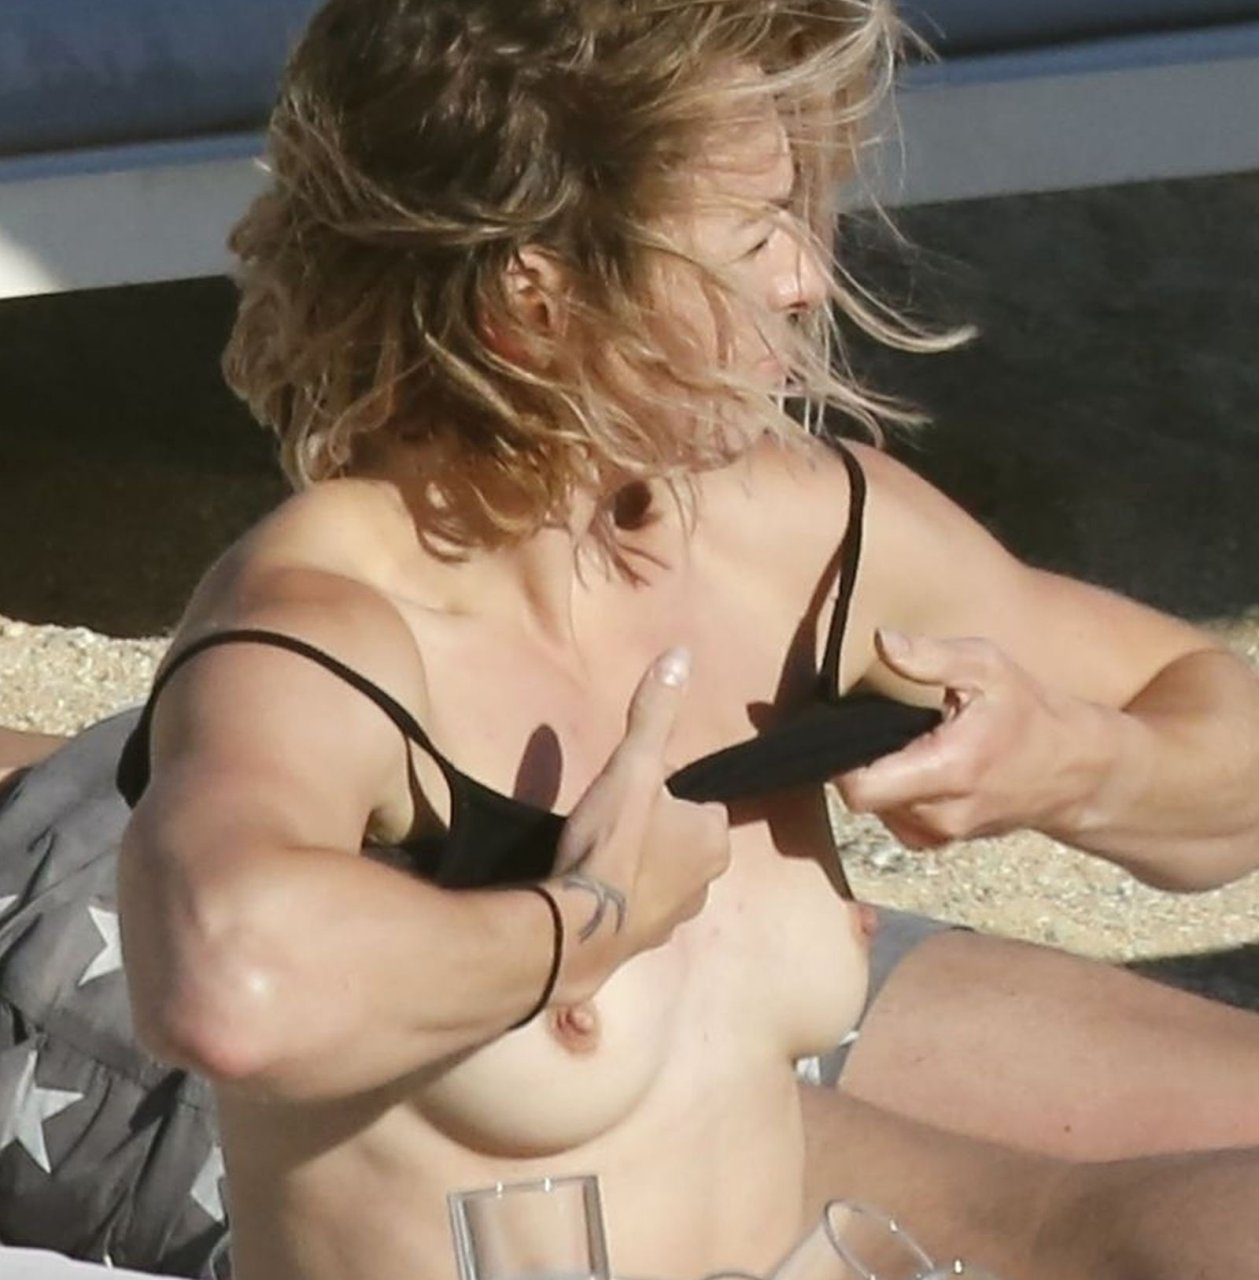 Stephanie-Pratt-Sexy-Topless-TheFappeningBlog.com-12.jpg